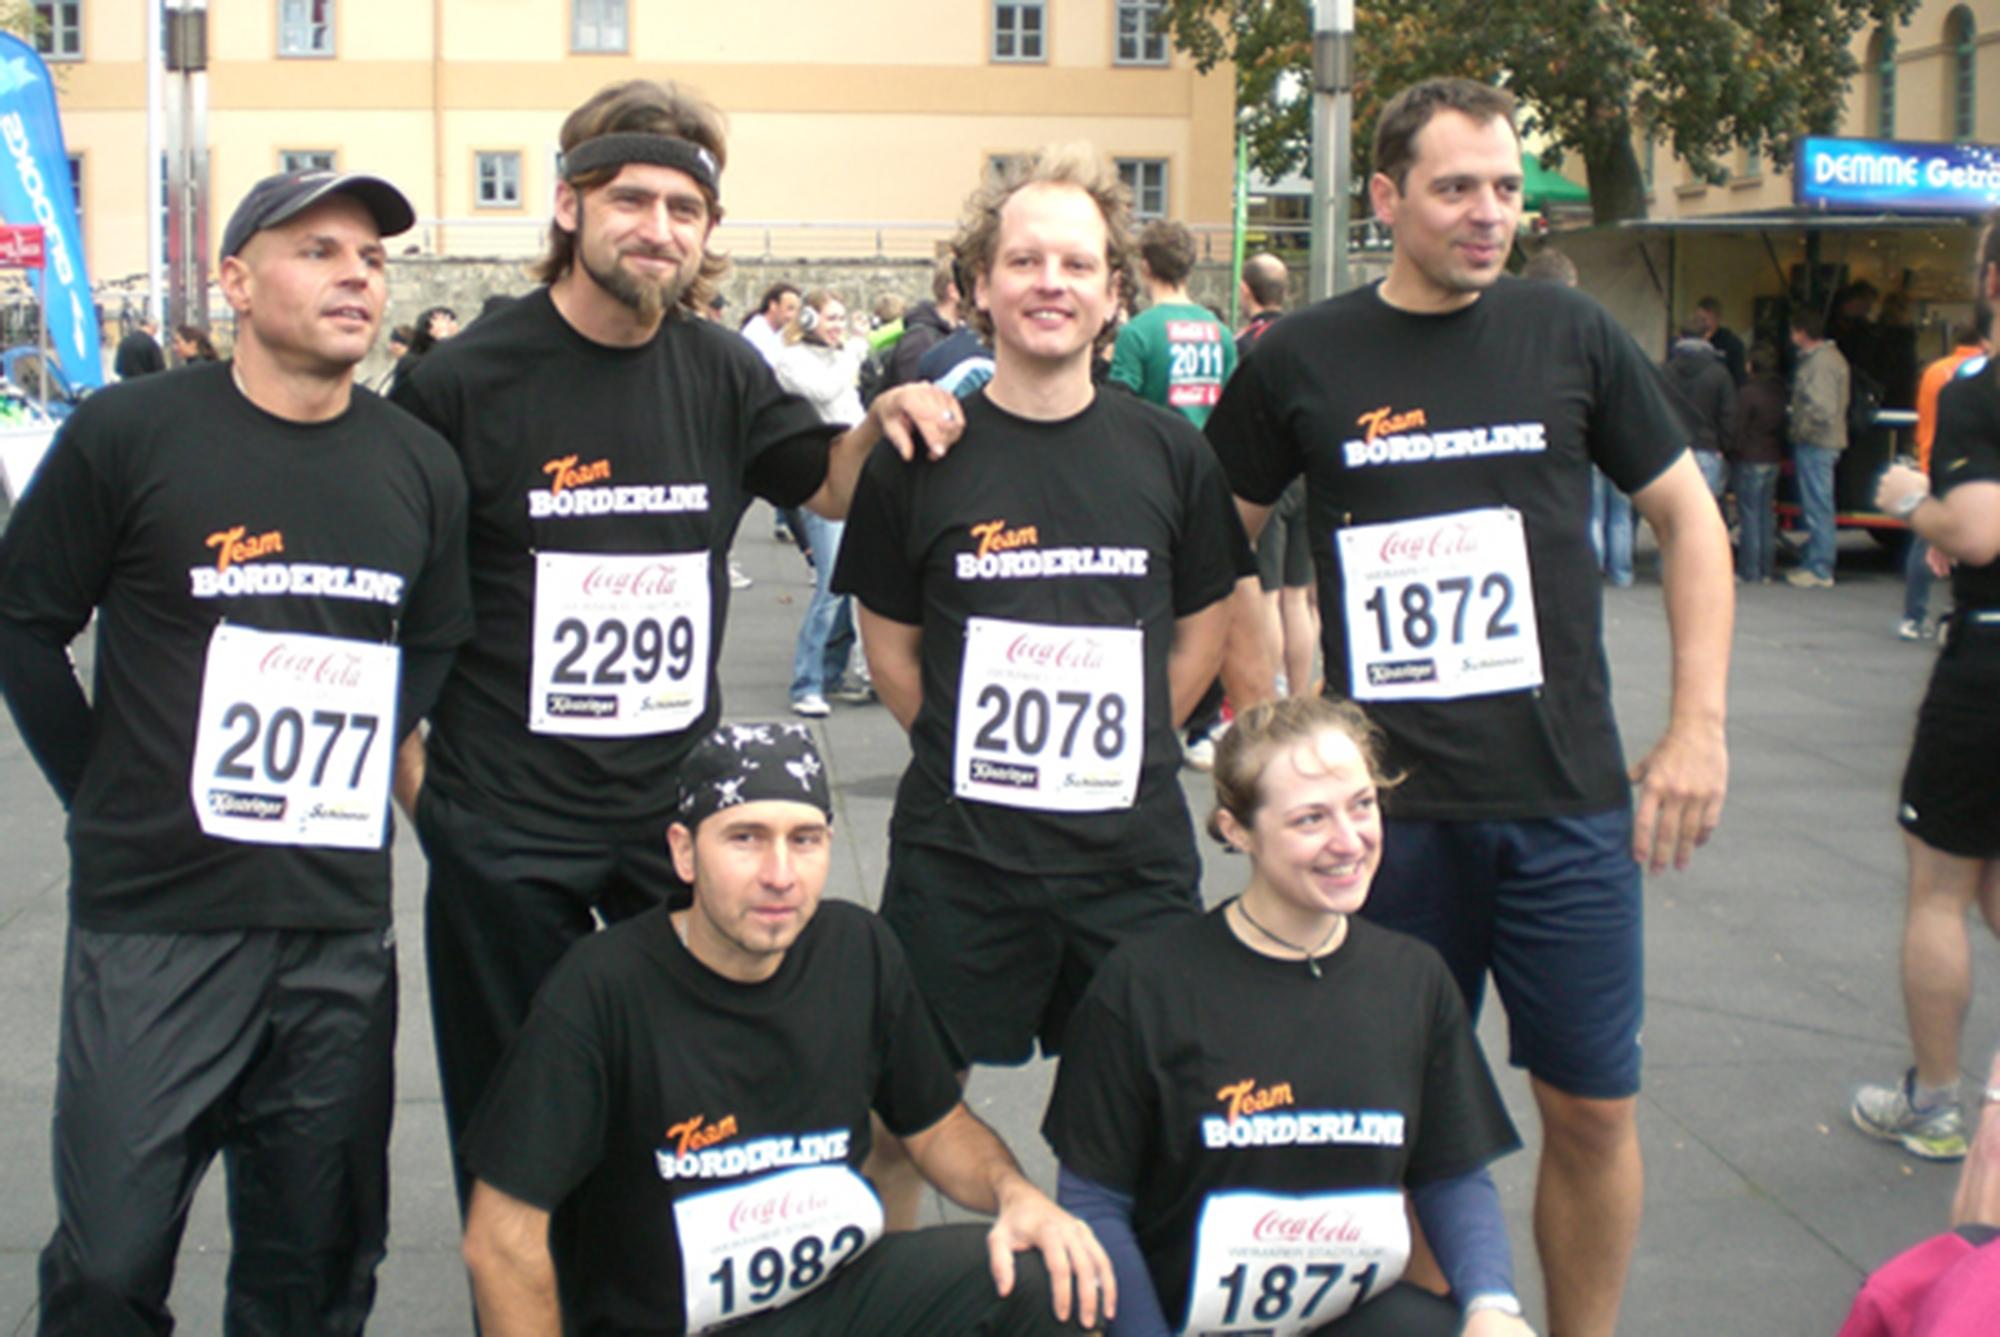 Team BORDERLINE